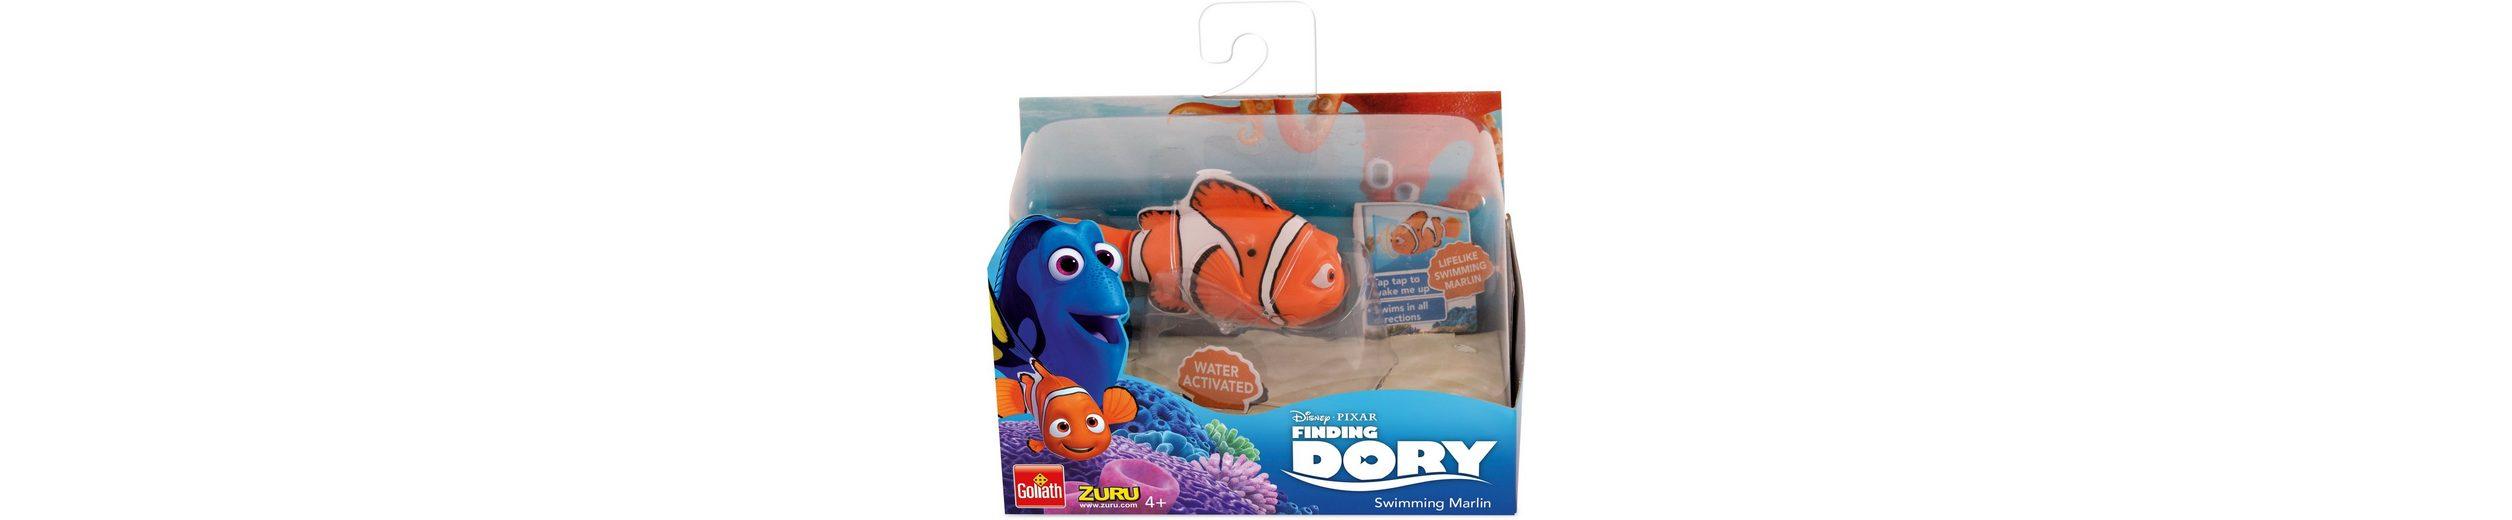 Goliath Wasserspielzeug, »Disney Pixar Finding Dory - Swimming Marlin«